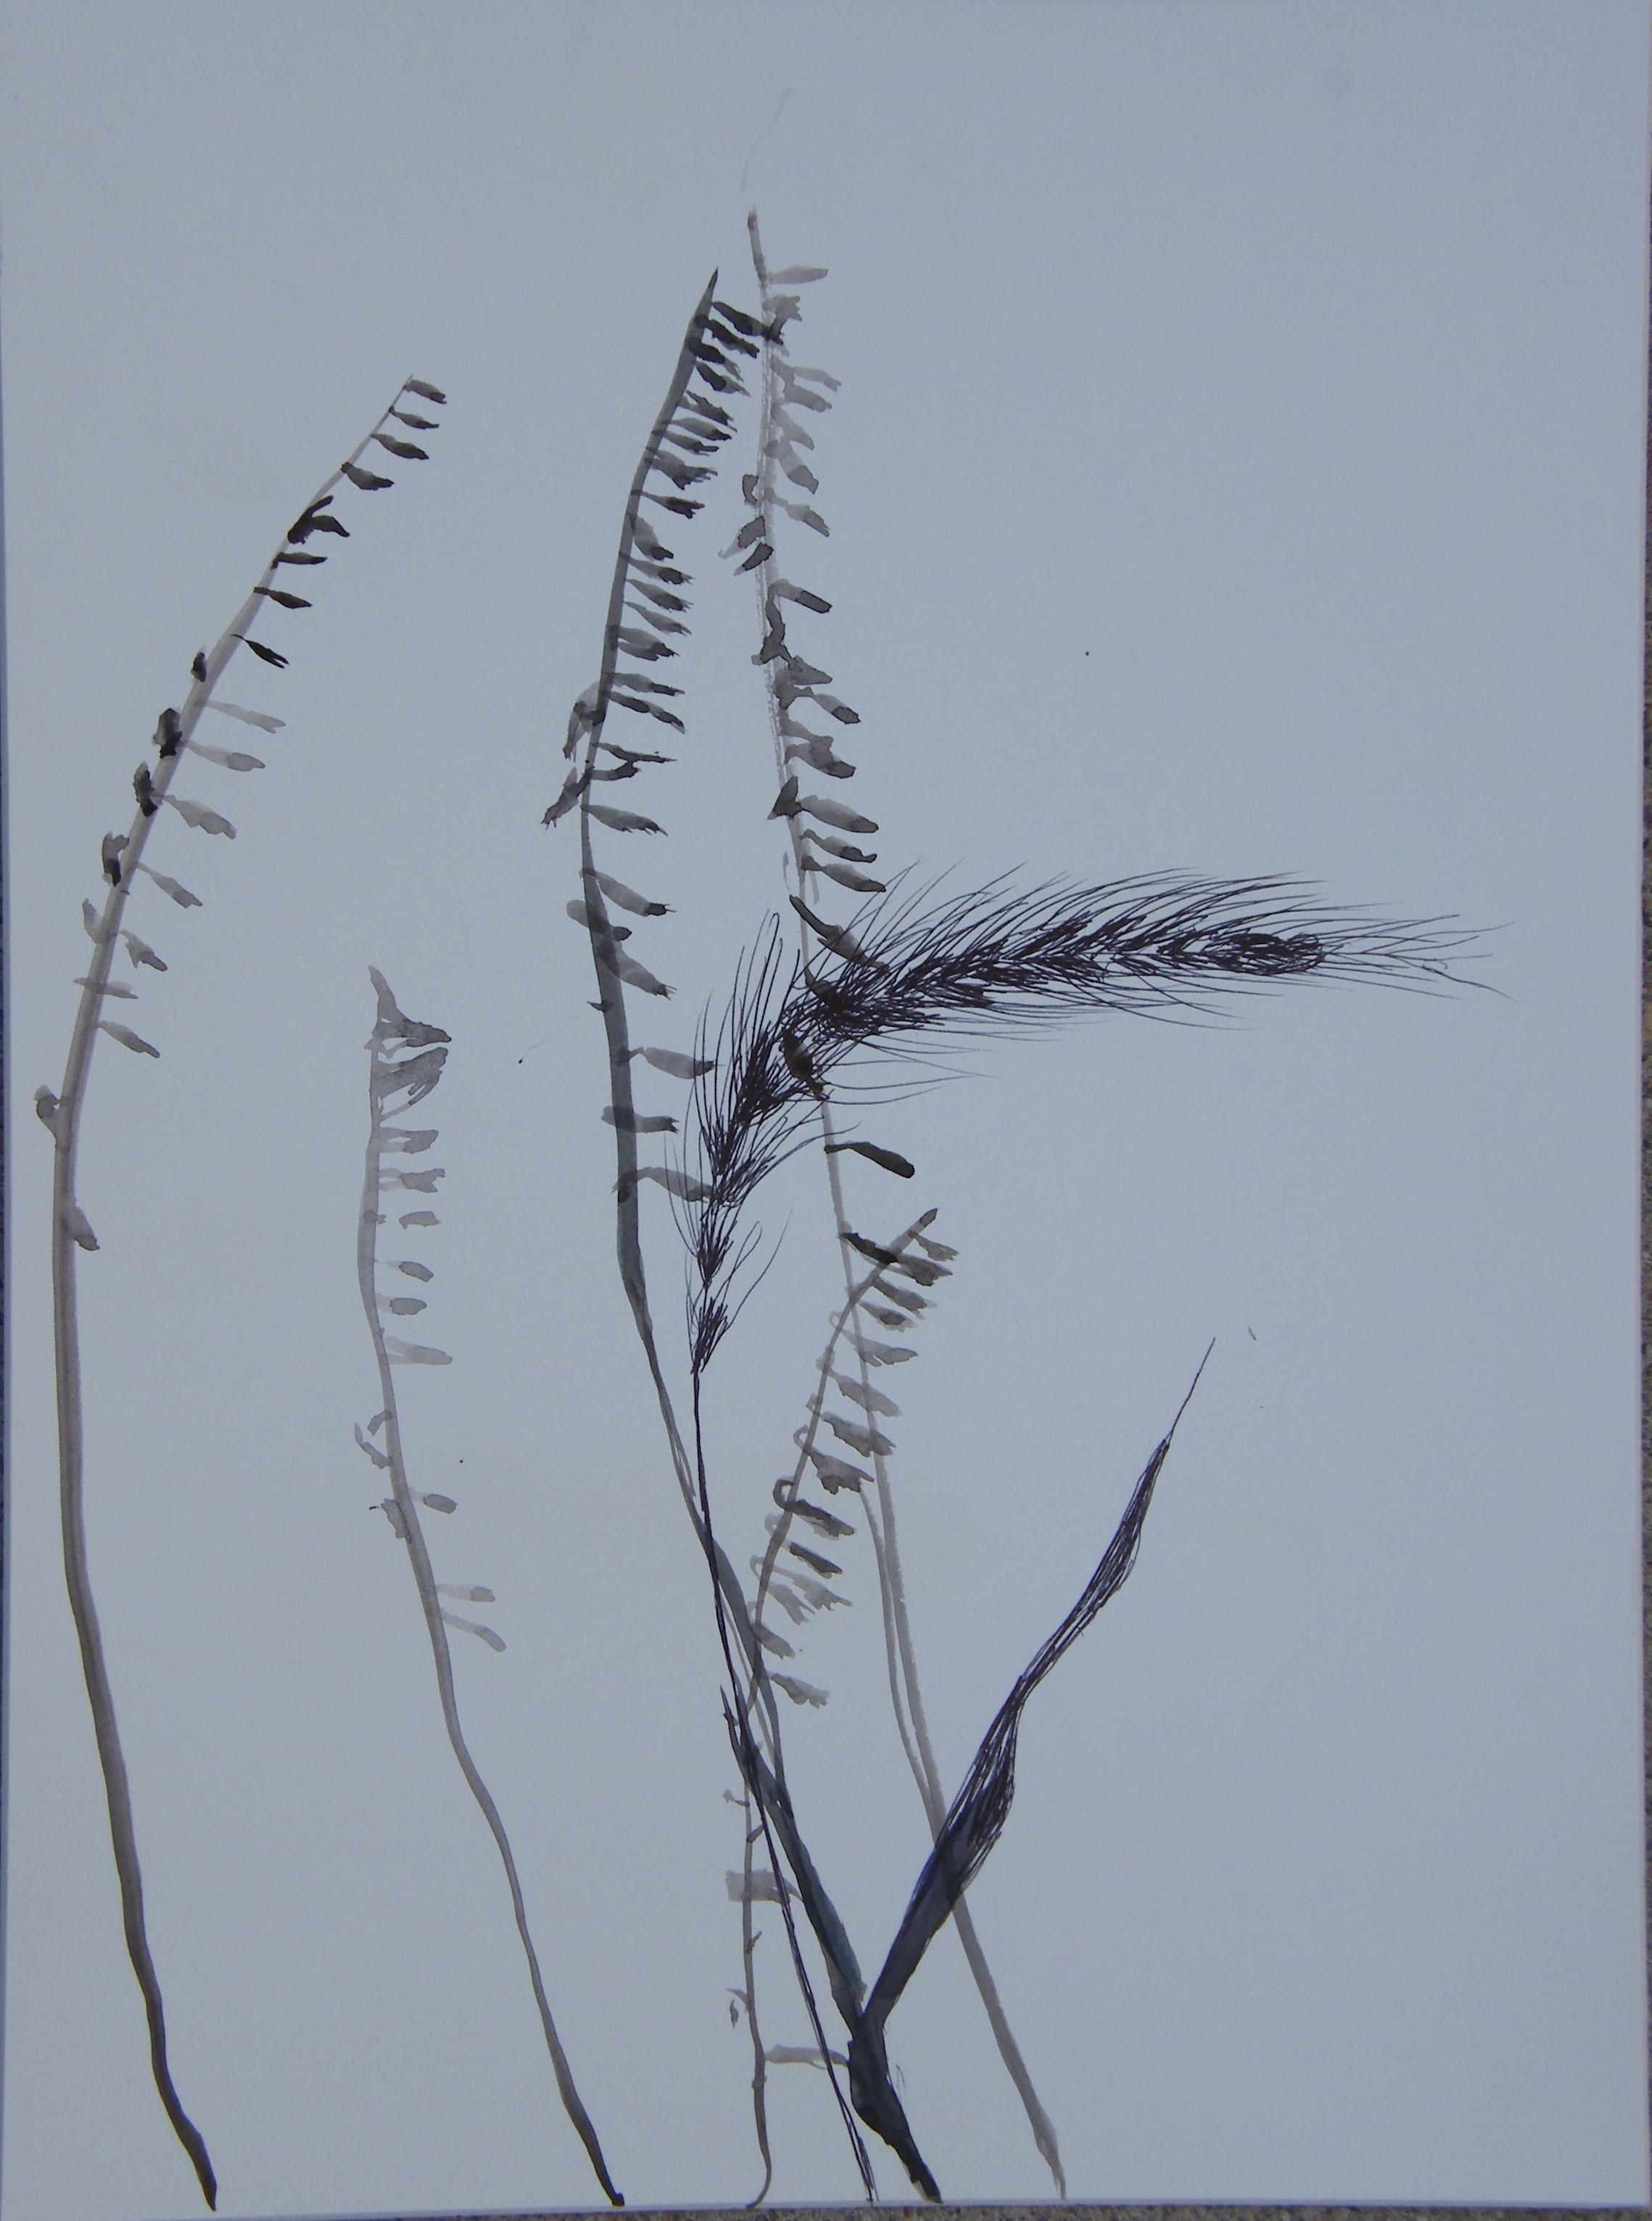 Silhouette painting/drawing, restored prairie